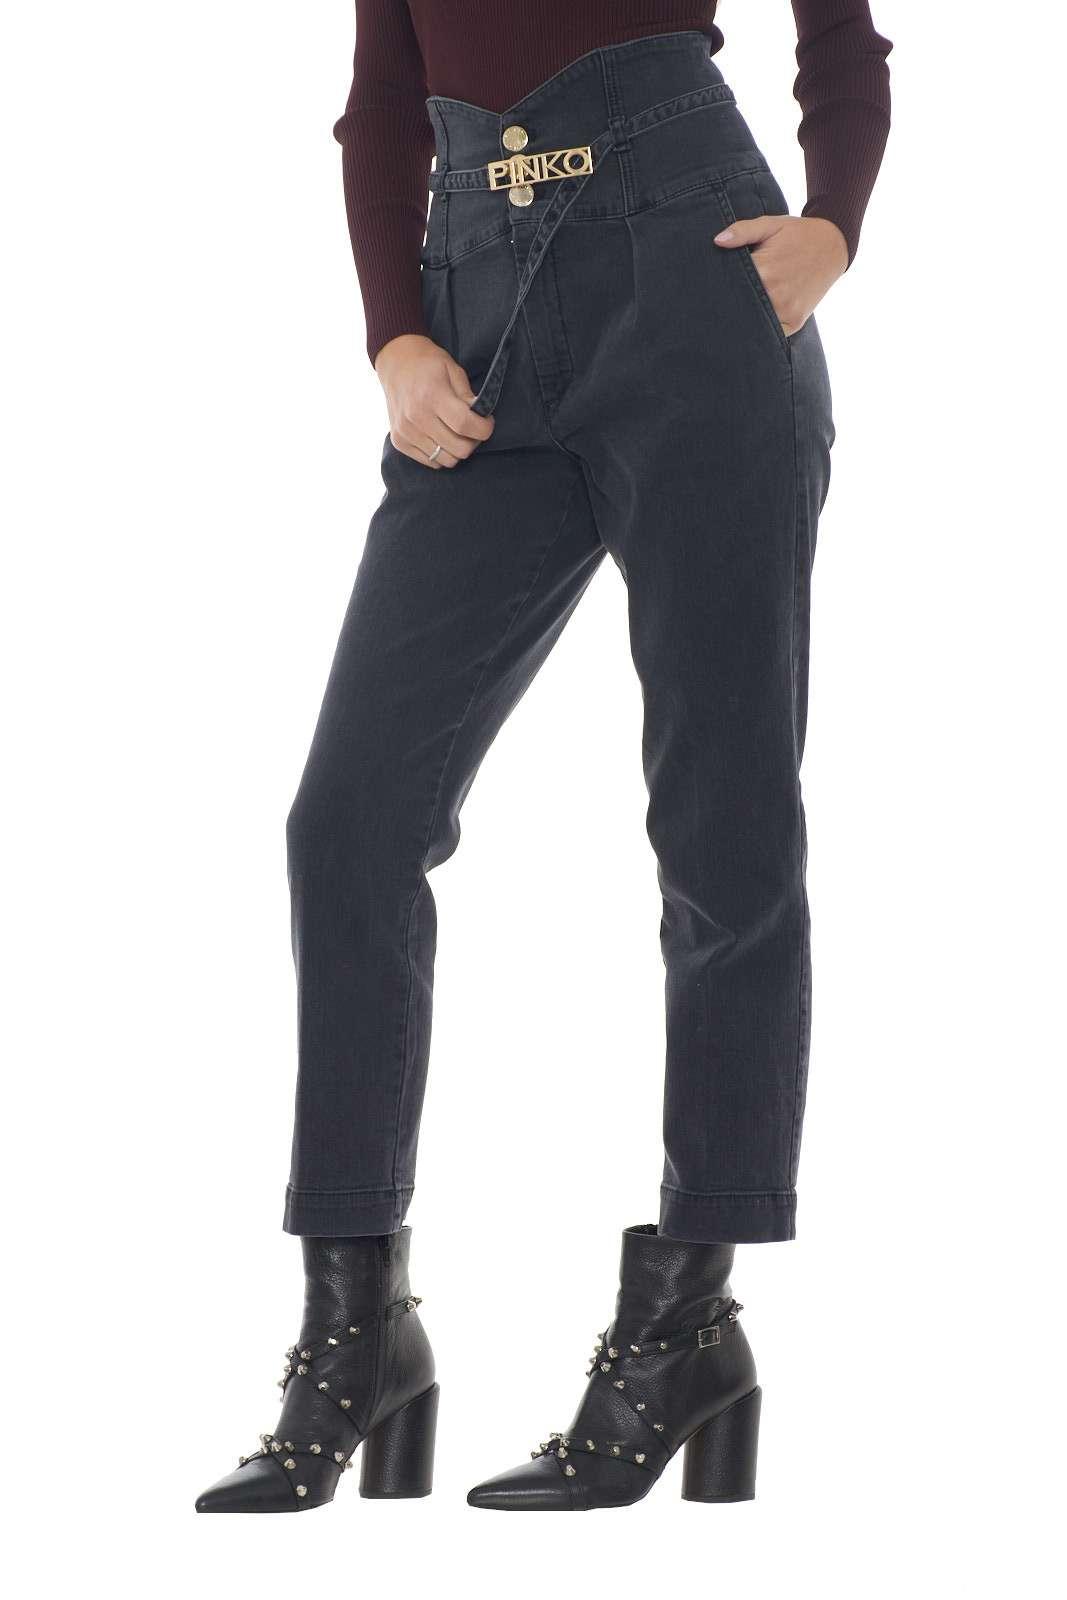 https://www.parmax.com/media/catalog/product/a/i/AI-outlet_parmax-pantaloni-donna-Pinko-1j10aj-B.jpg